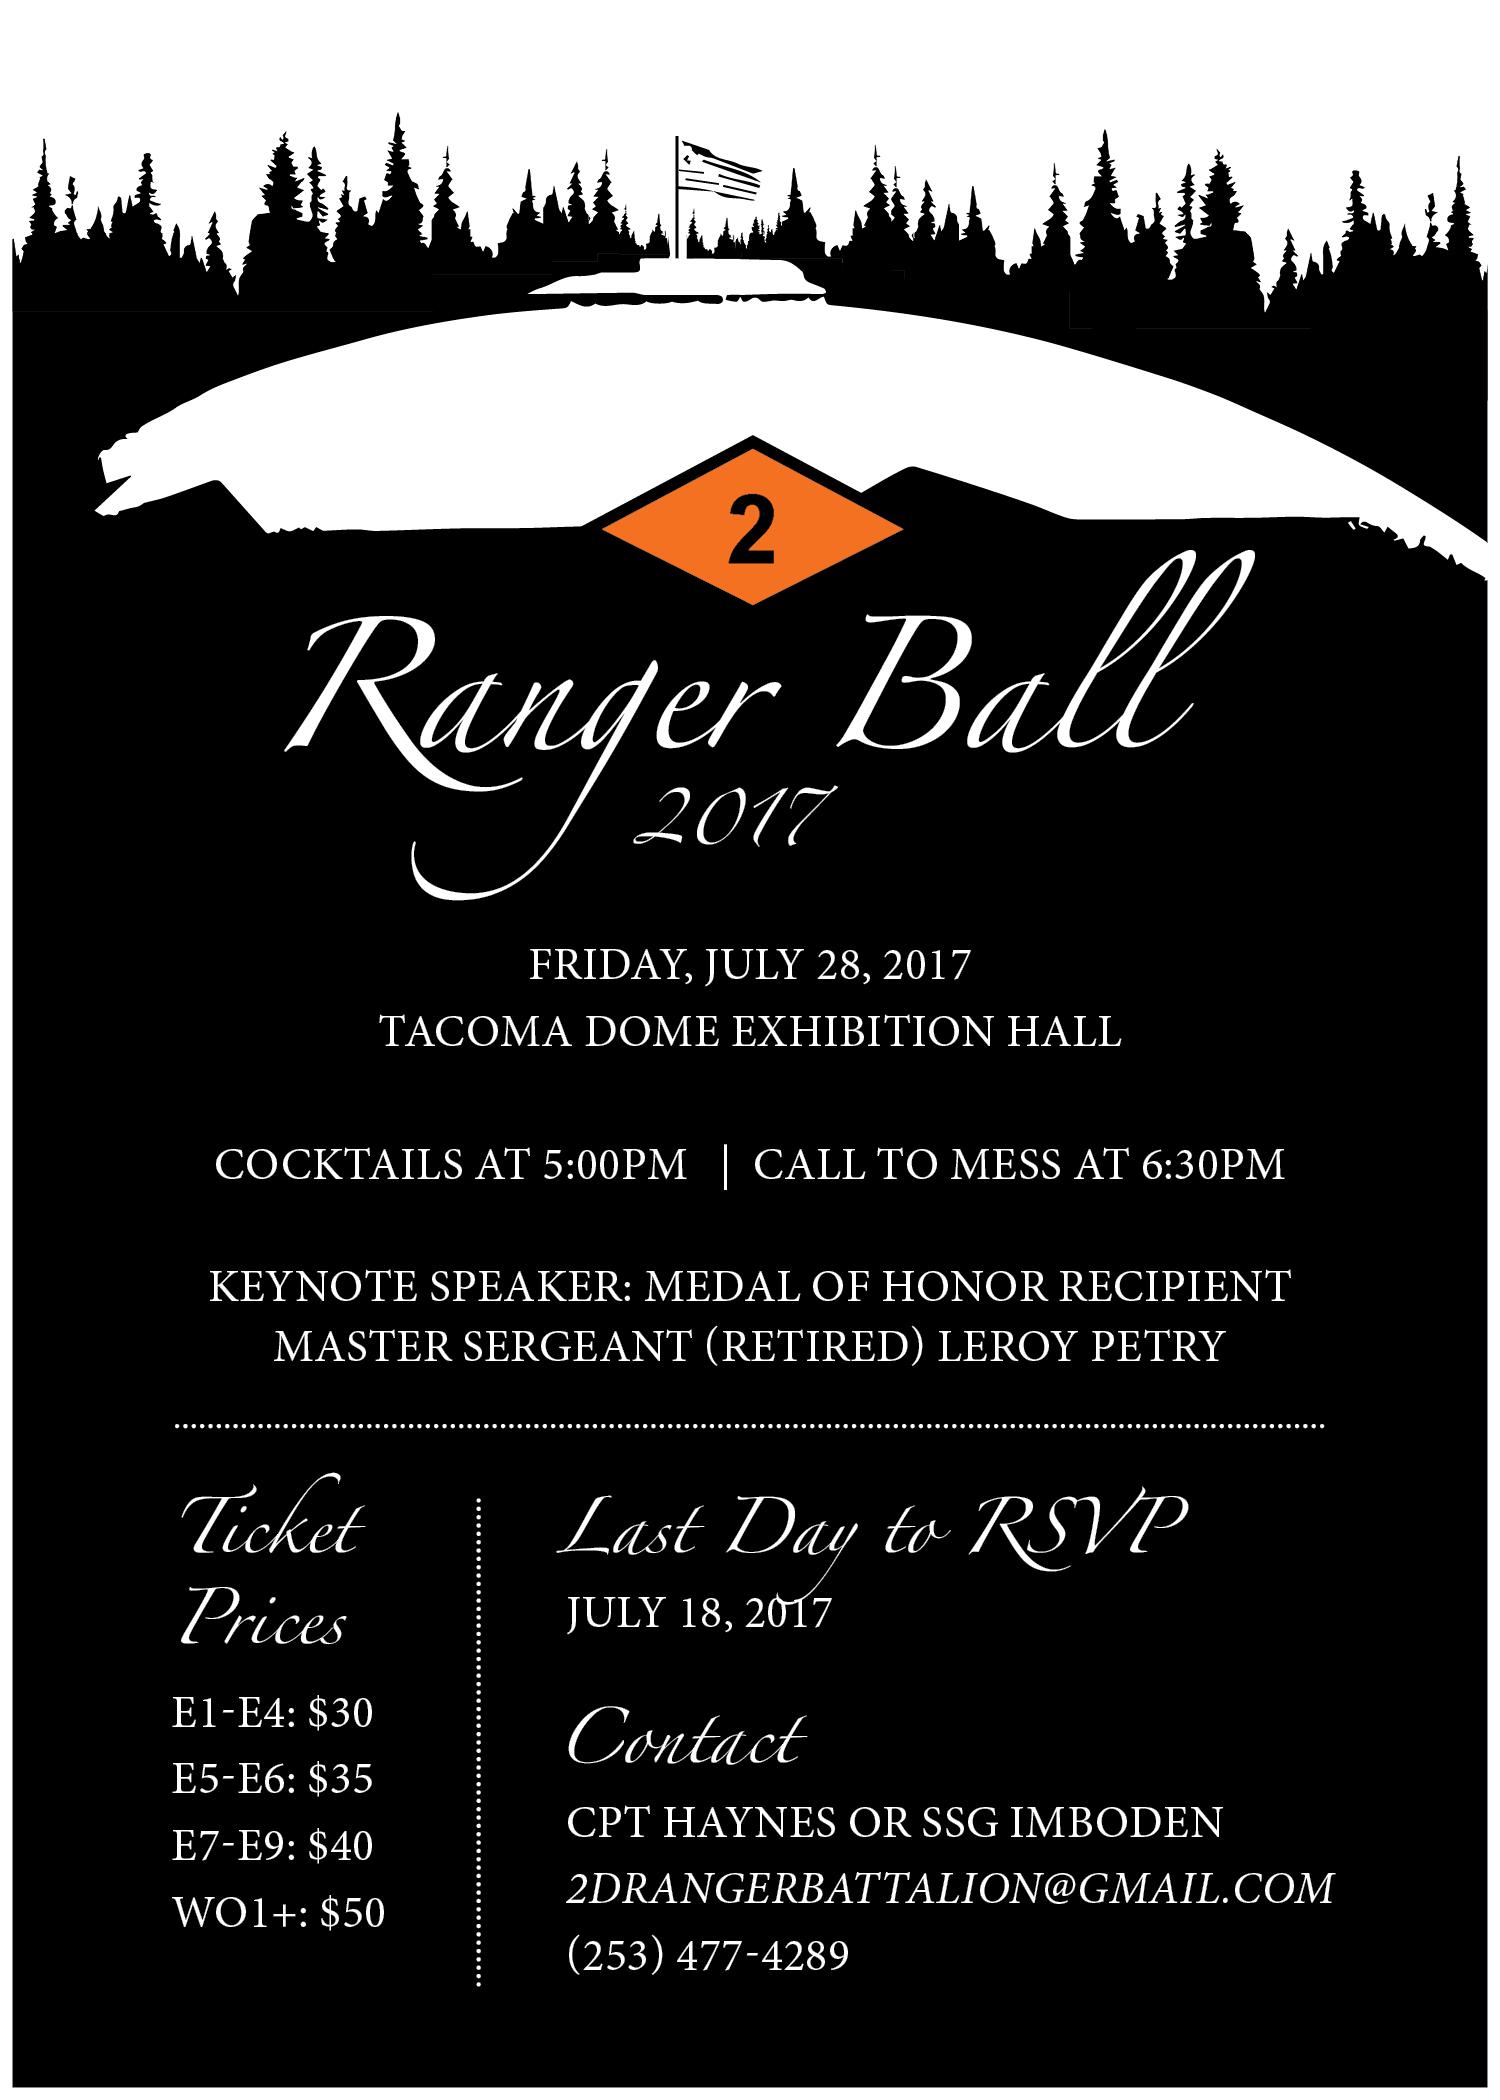 Ranger Ball